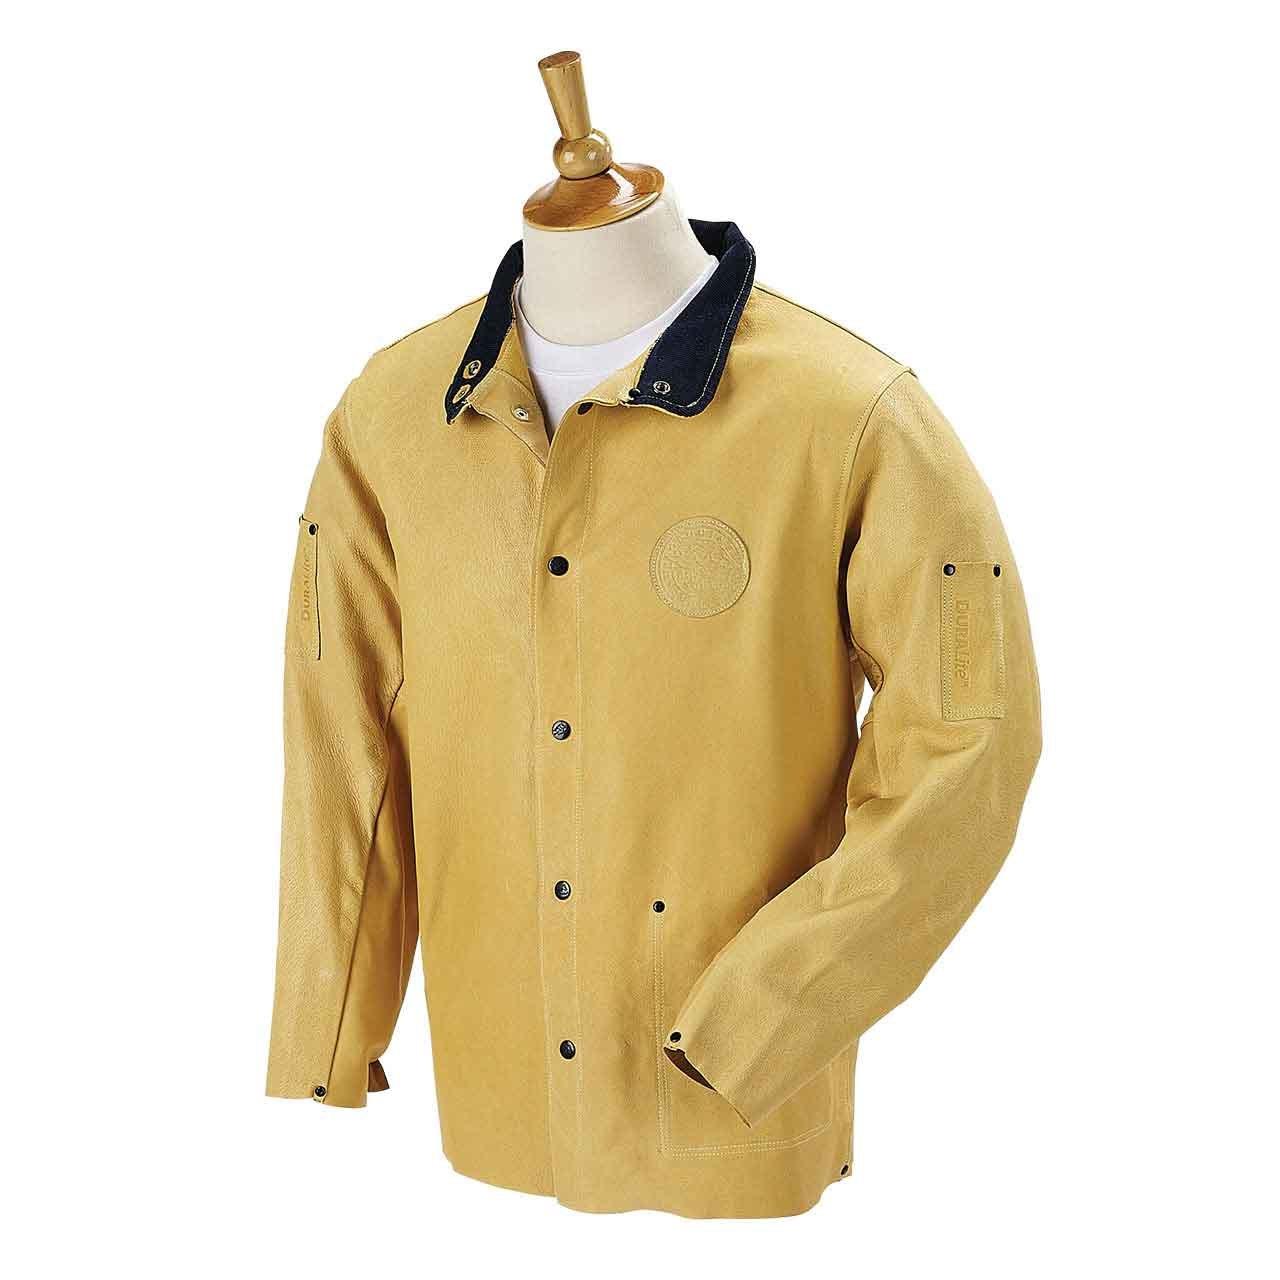 DuraLite Premium Grain Pigskin Welding Coat - 30'', Size X-Large by Black Stallion (Image #1)